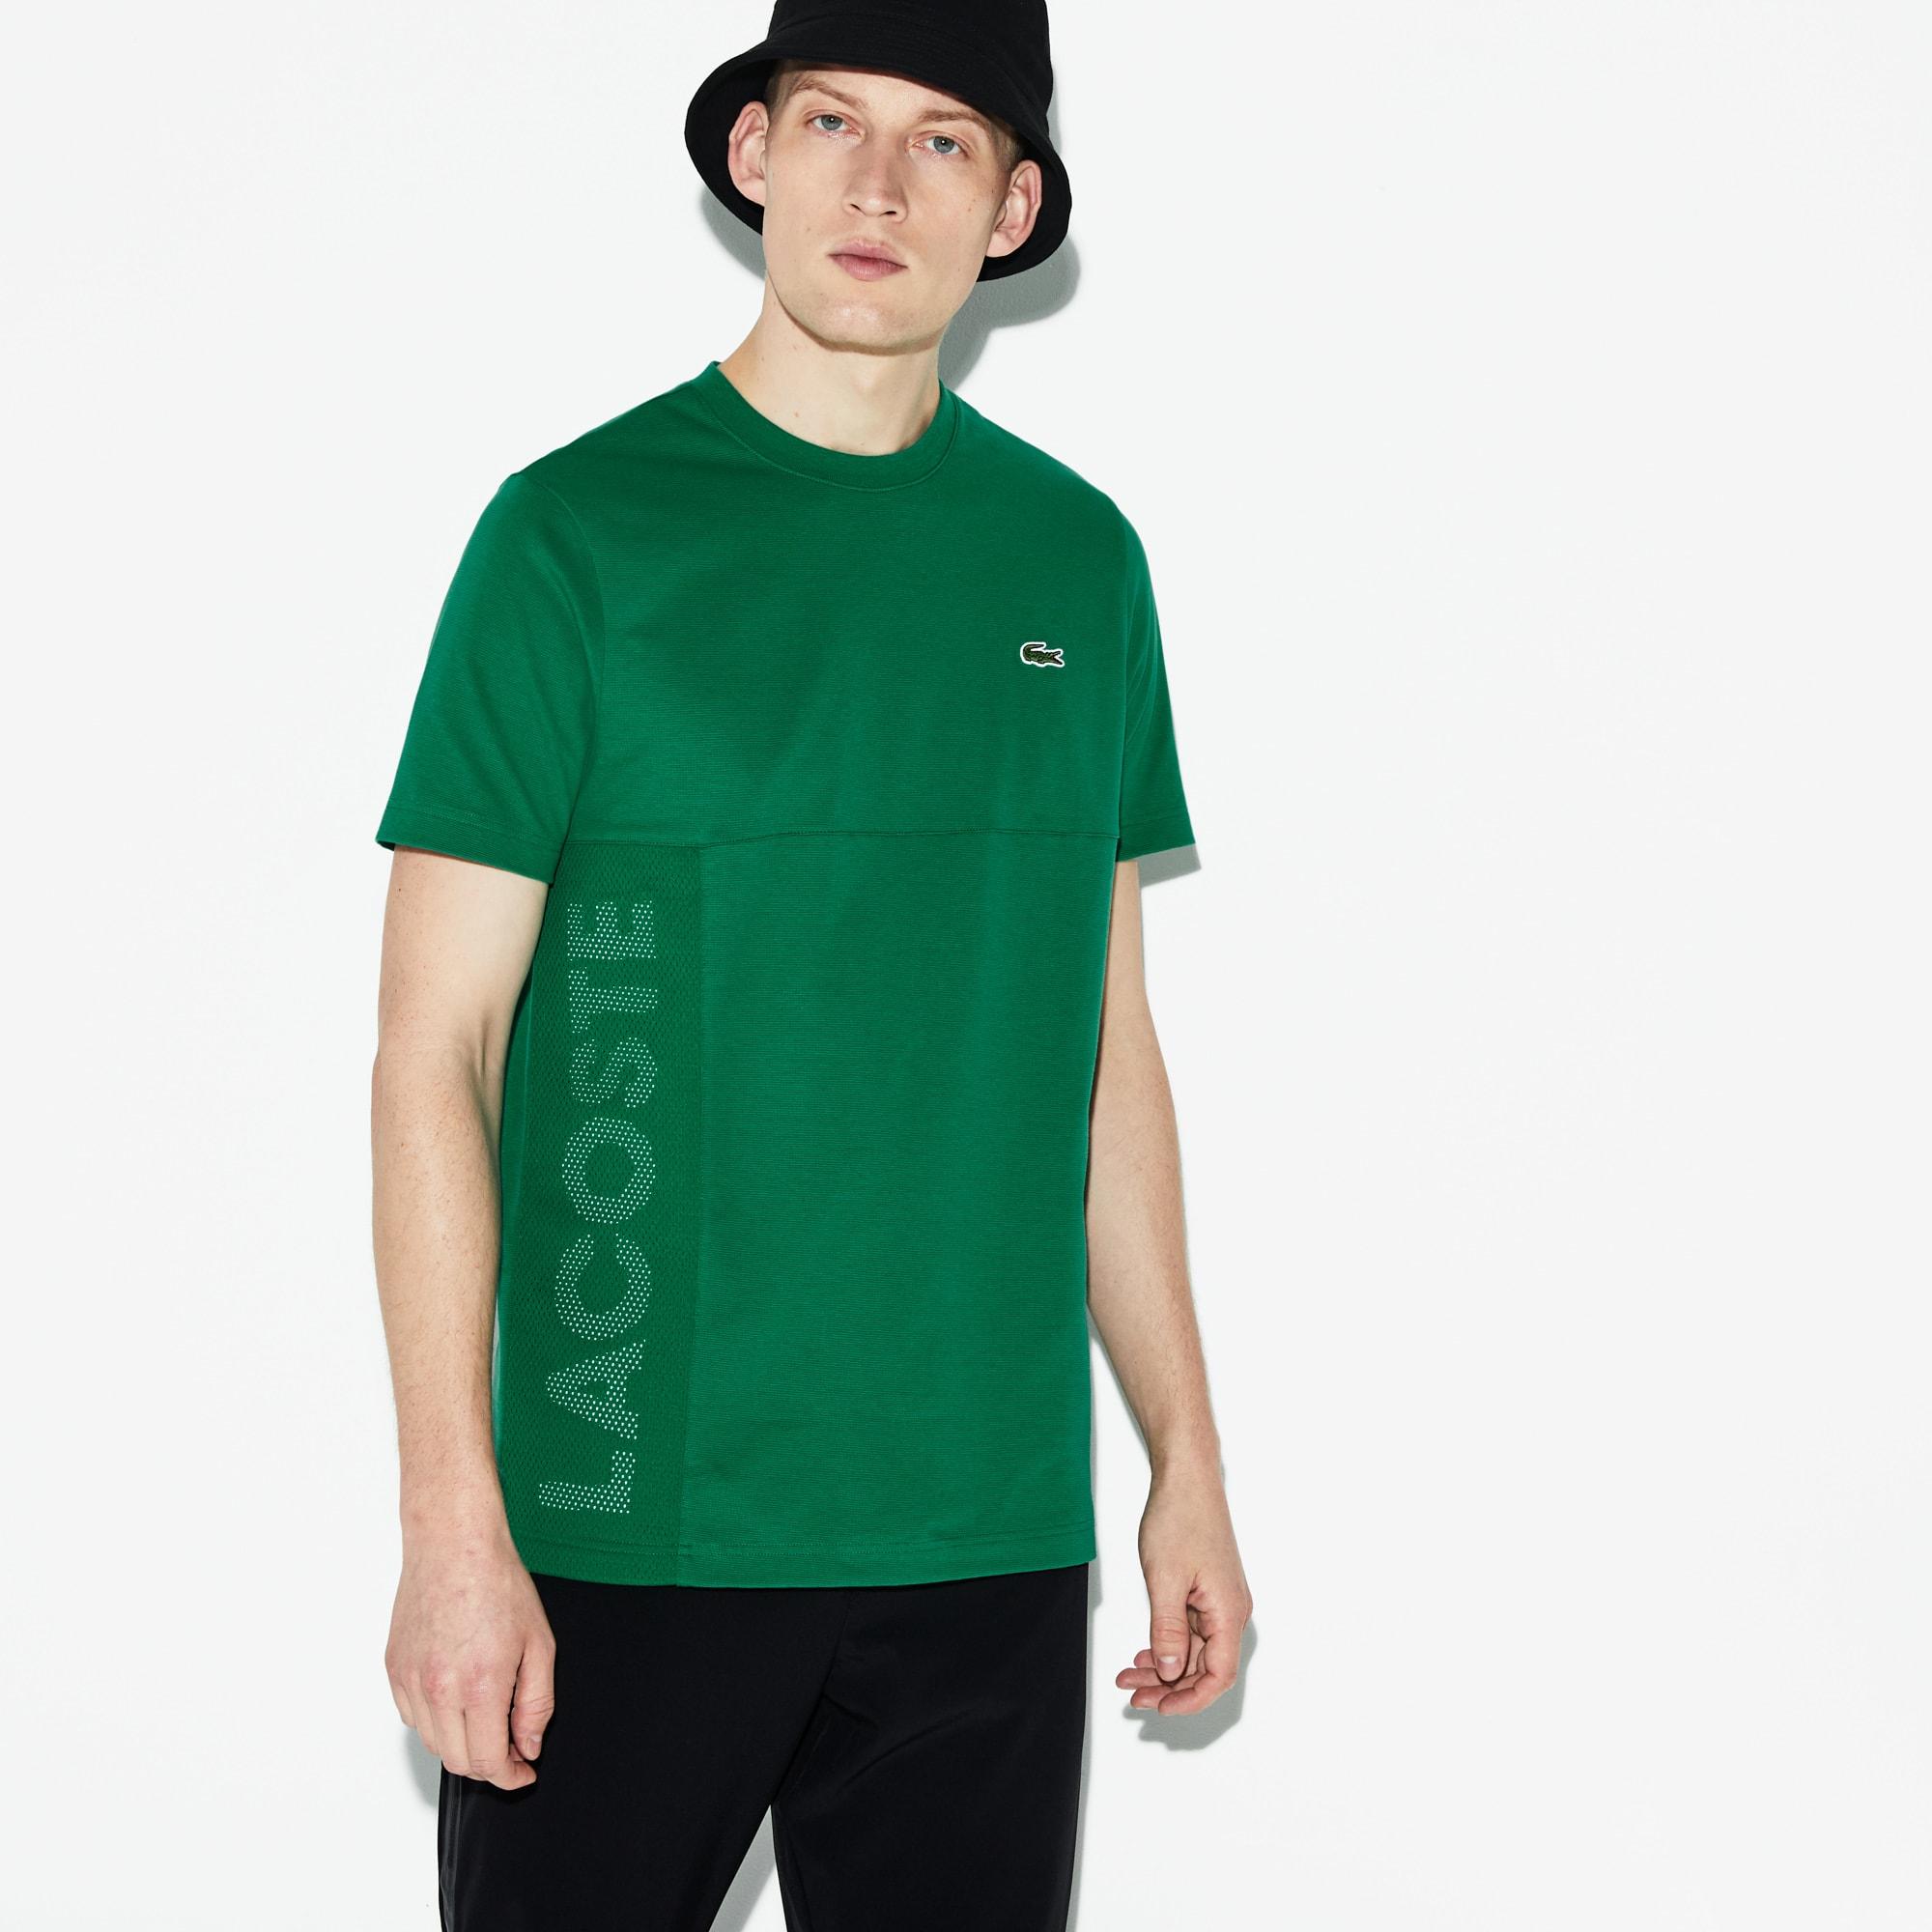 62880e9540f6 Men s Lacoste SPORT Crew Neck Lettered Ultra Light Cotton T-shirt ...